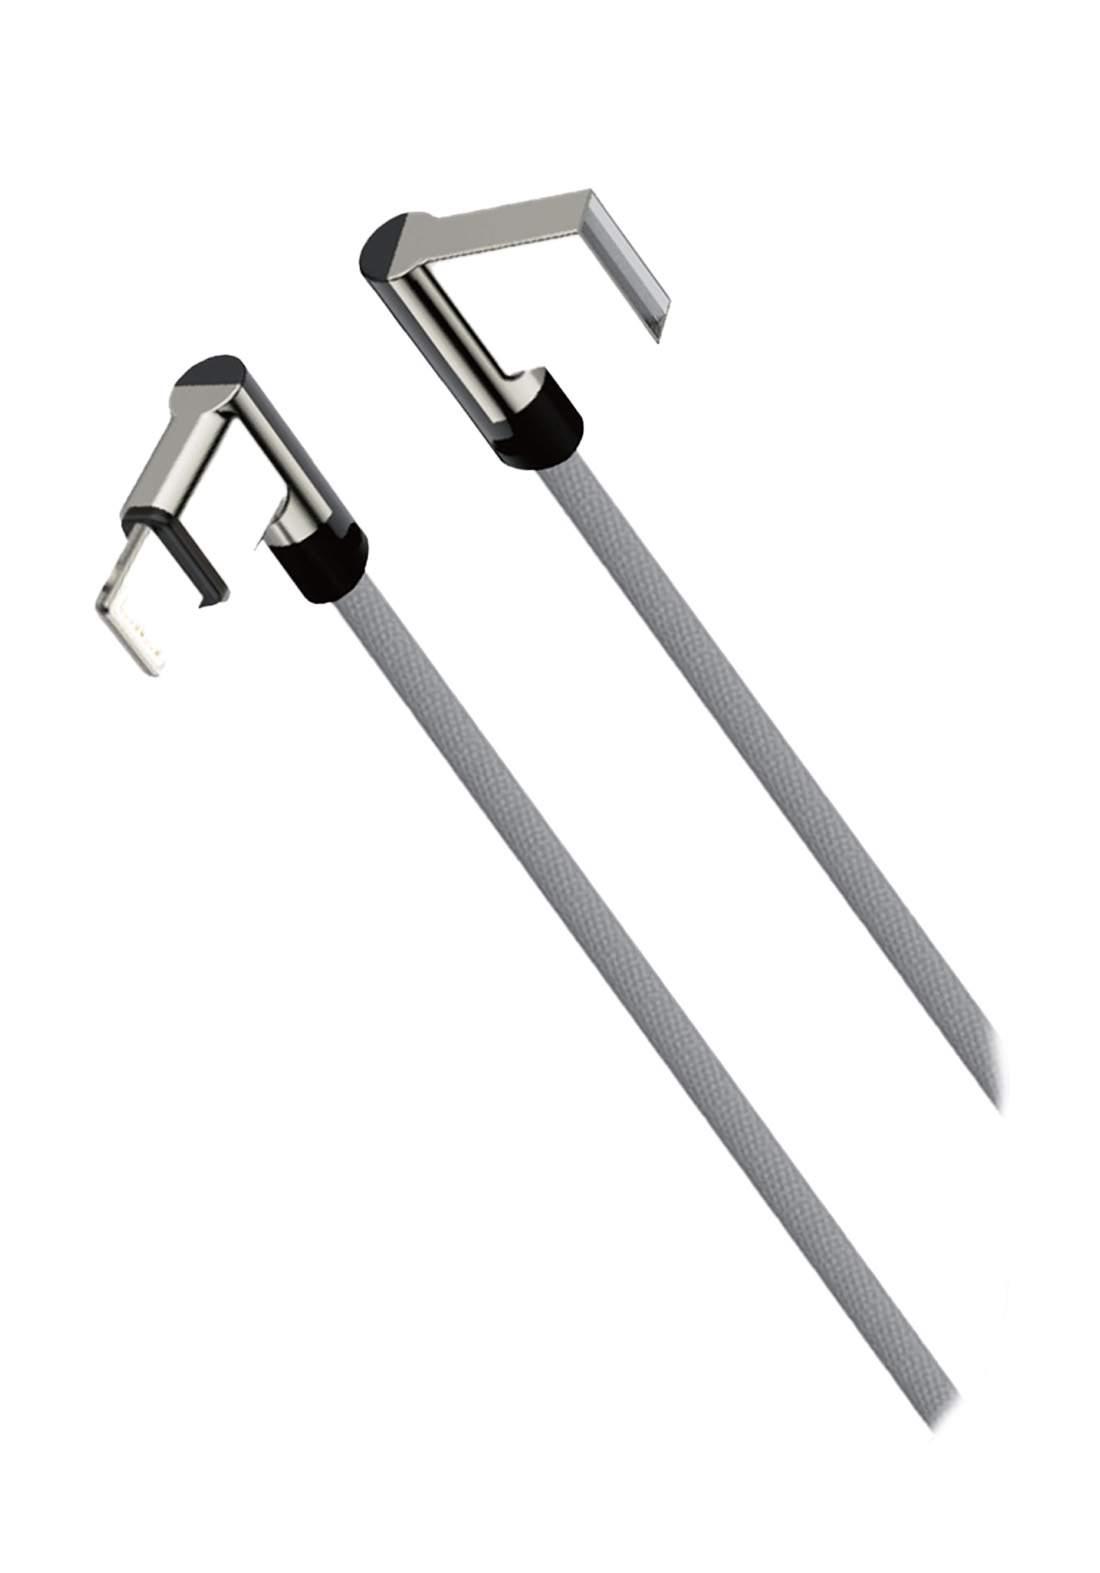 Optiva OPC23i USB 2.0 to Lightning Cable 2m - Silver كابل